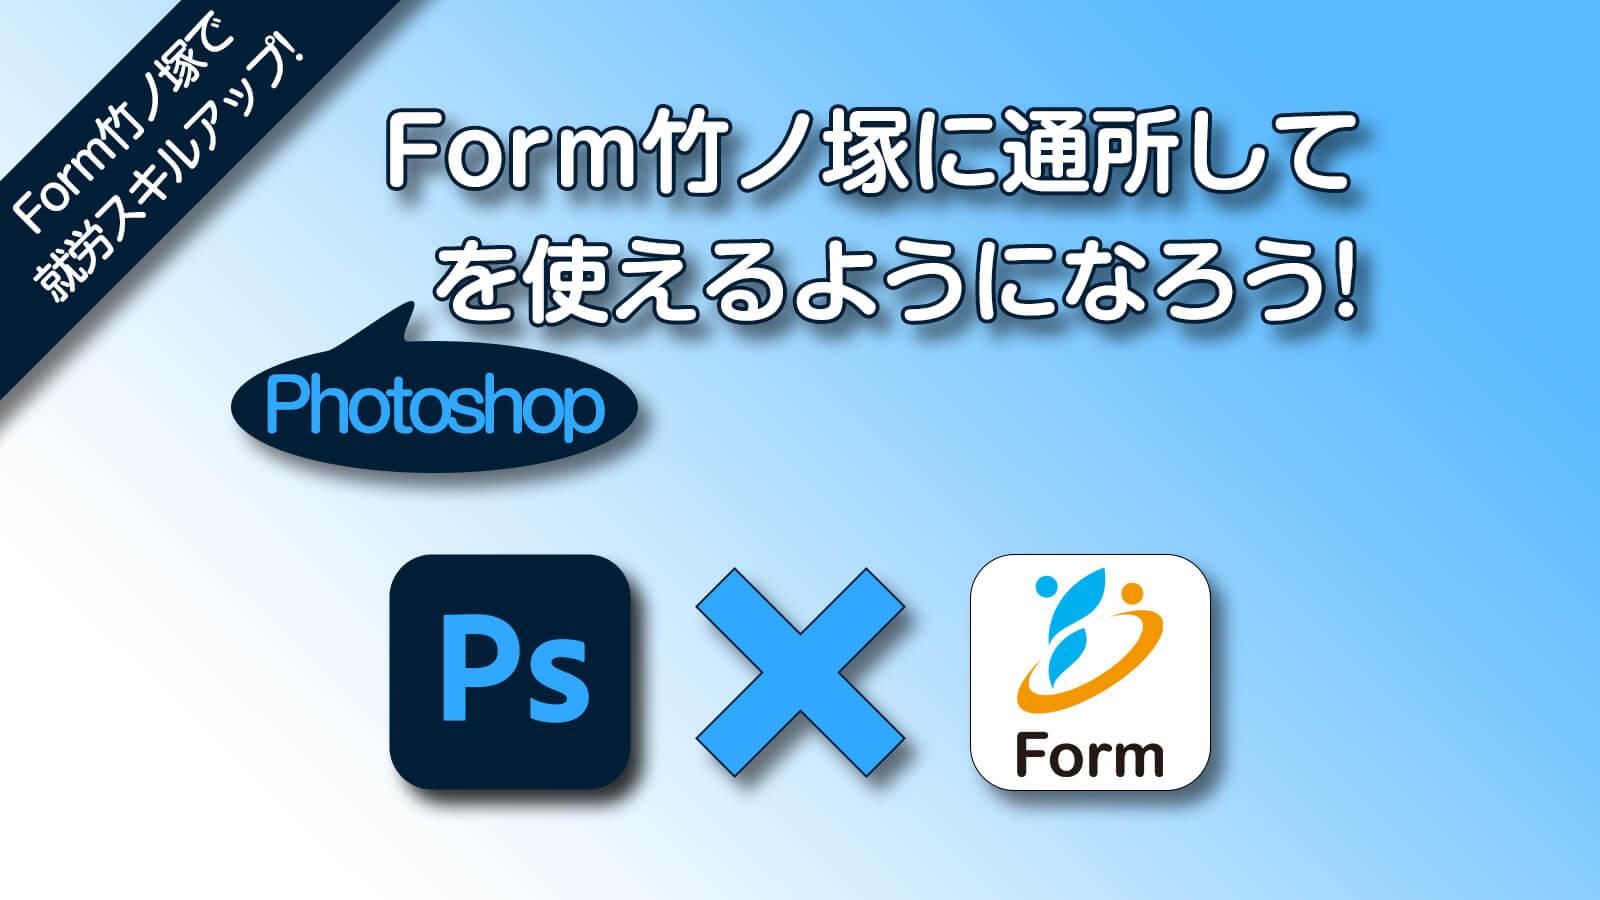 Photoshop講座入門編Form竹ノ塚だけの訓練で就労スキルアップ!概要画像